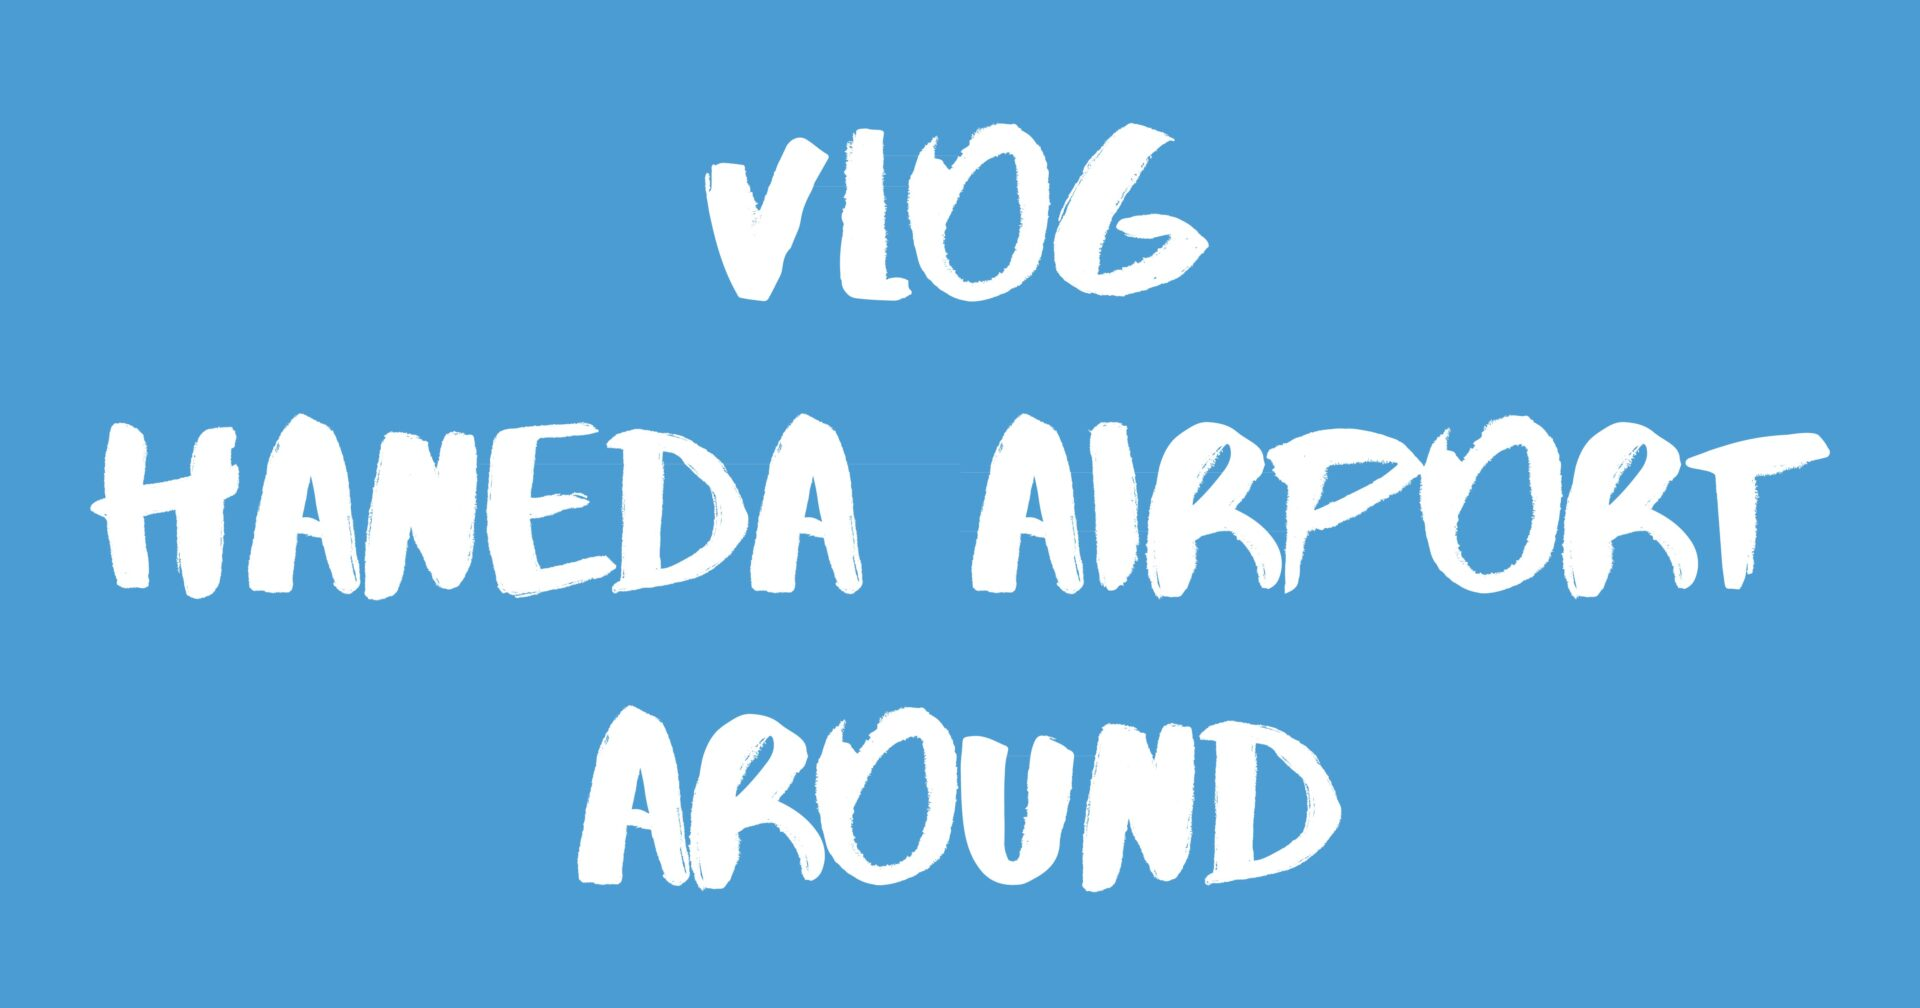 [Vlog] 羽田空港&周辺エリア / Haneda Airport & Around